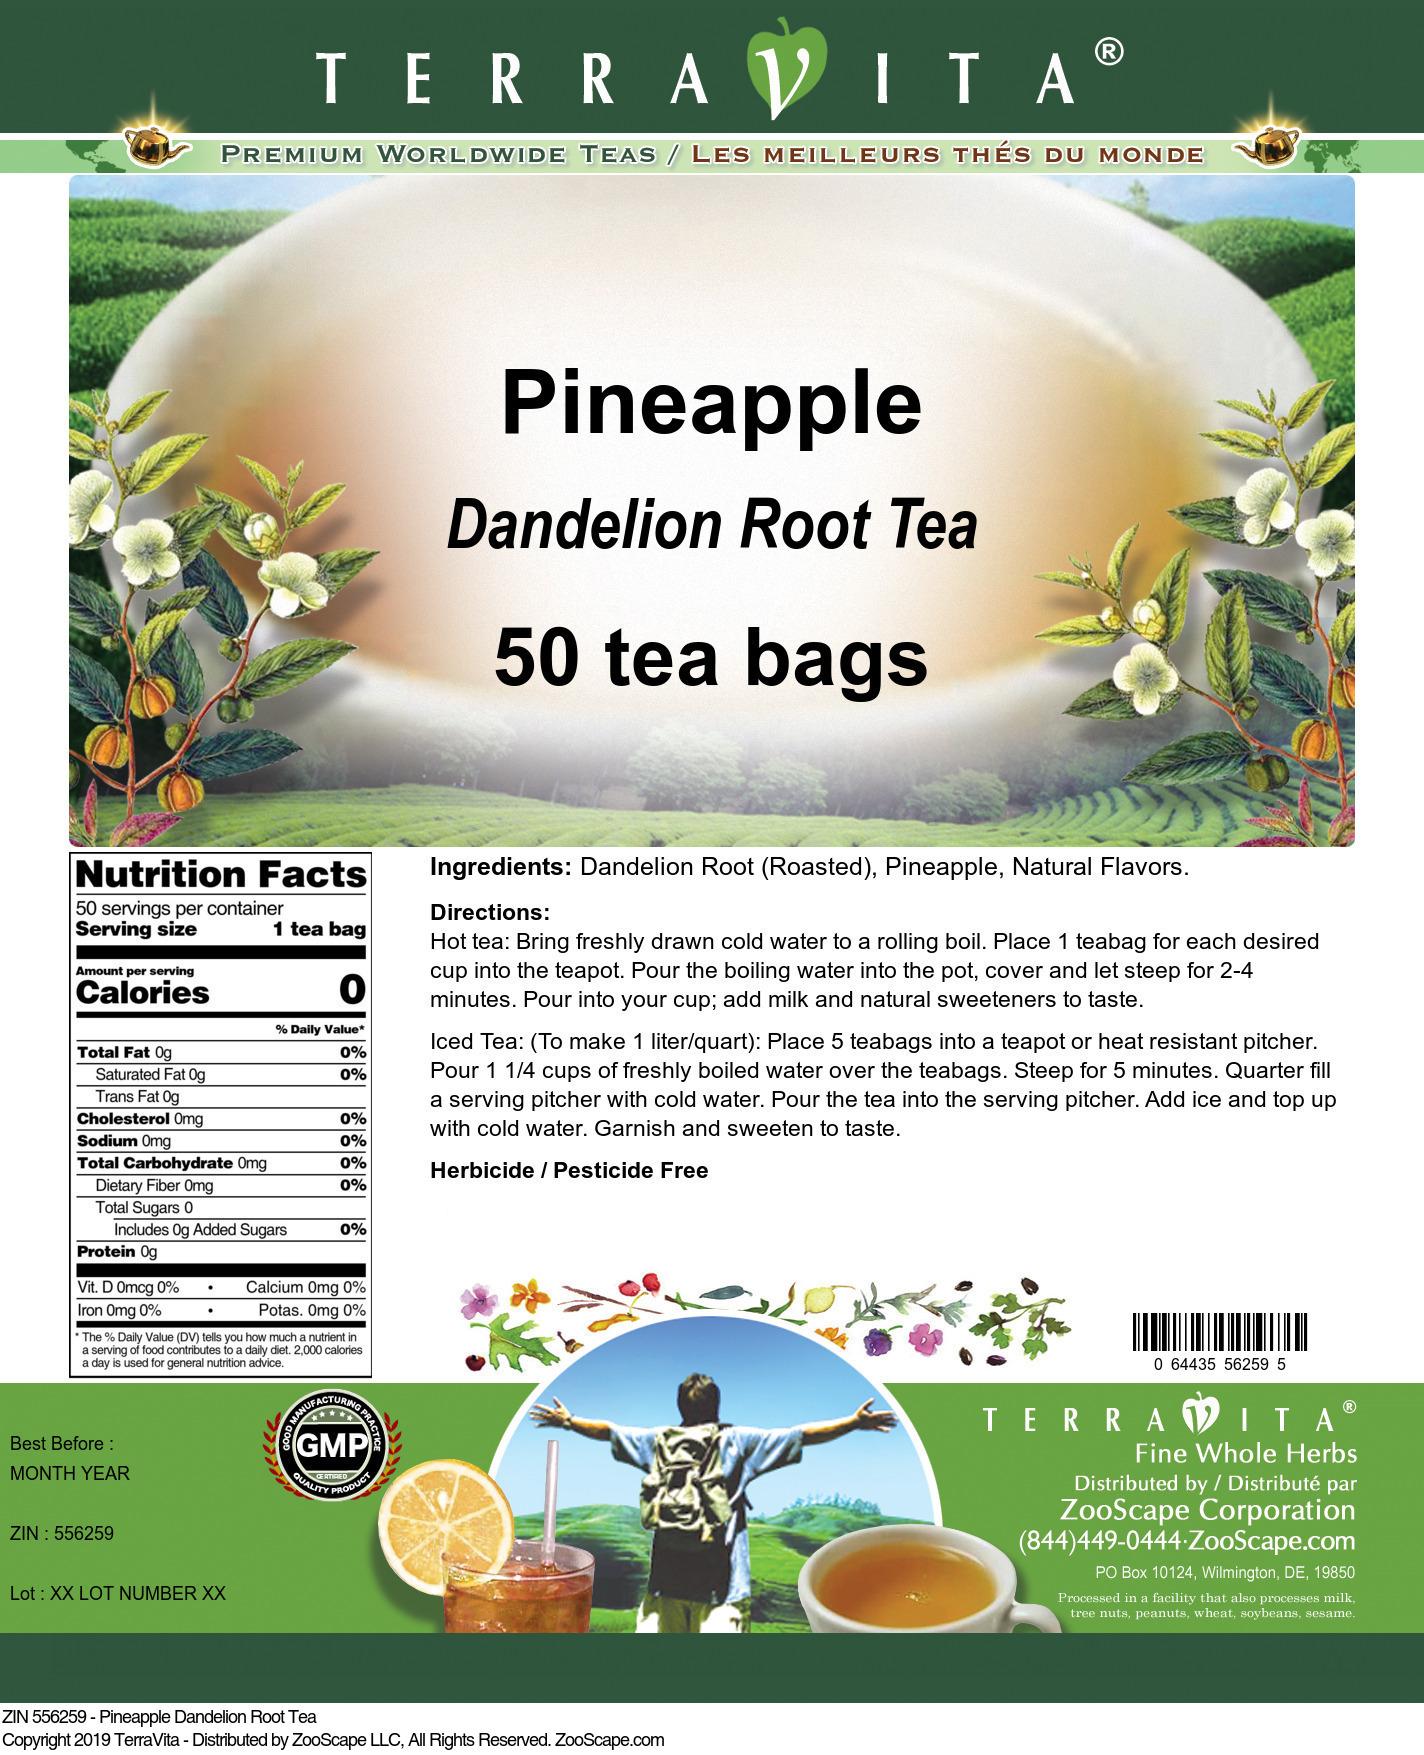 Pineapple Dandelion Root